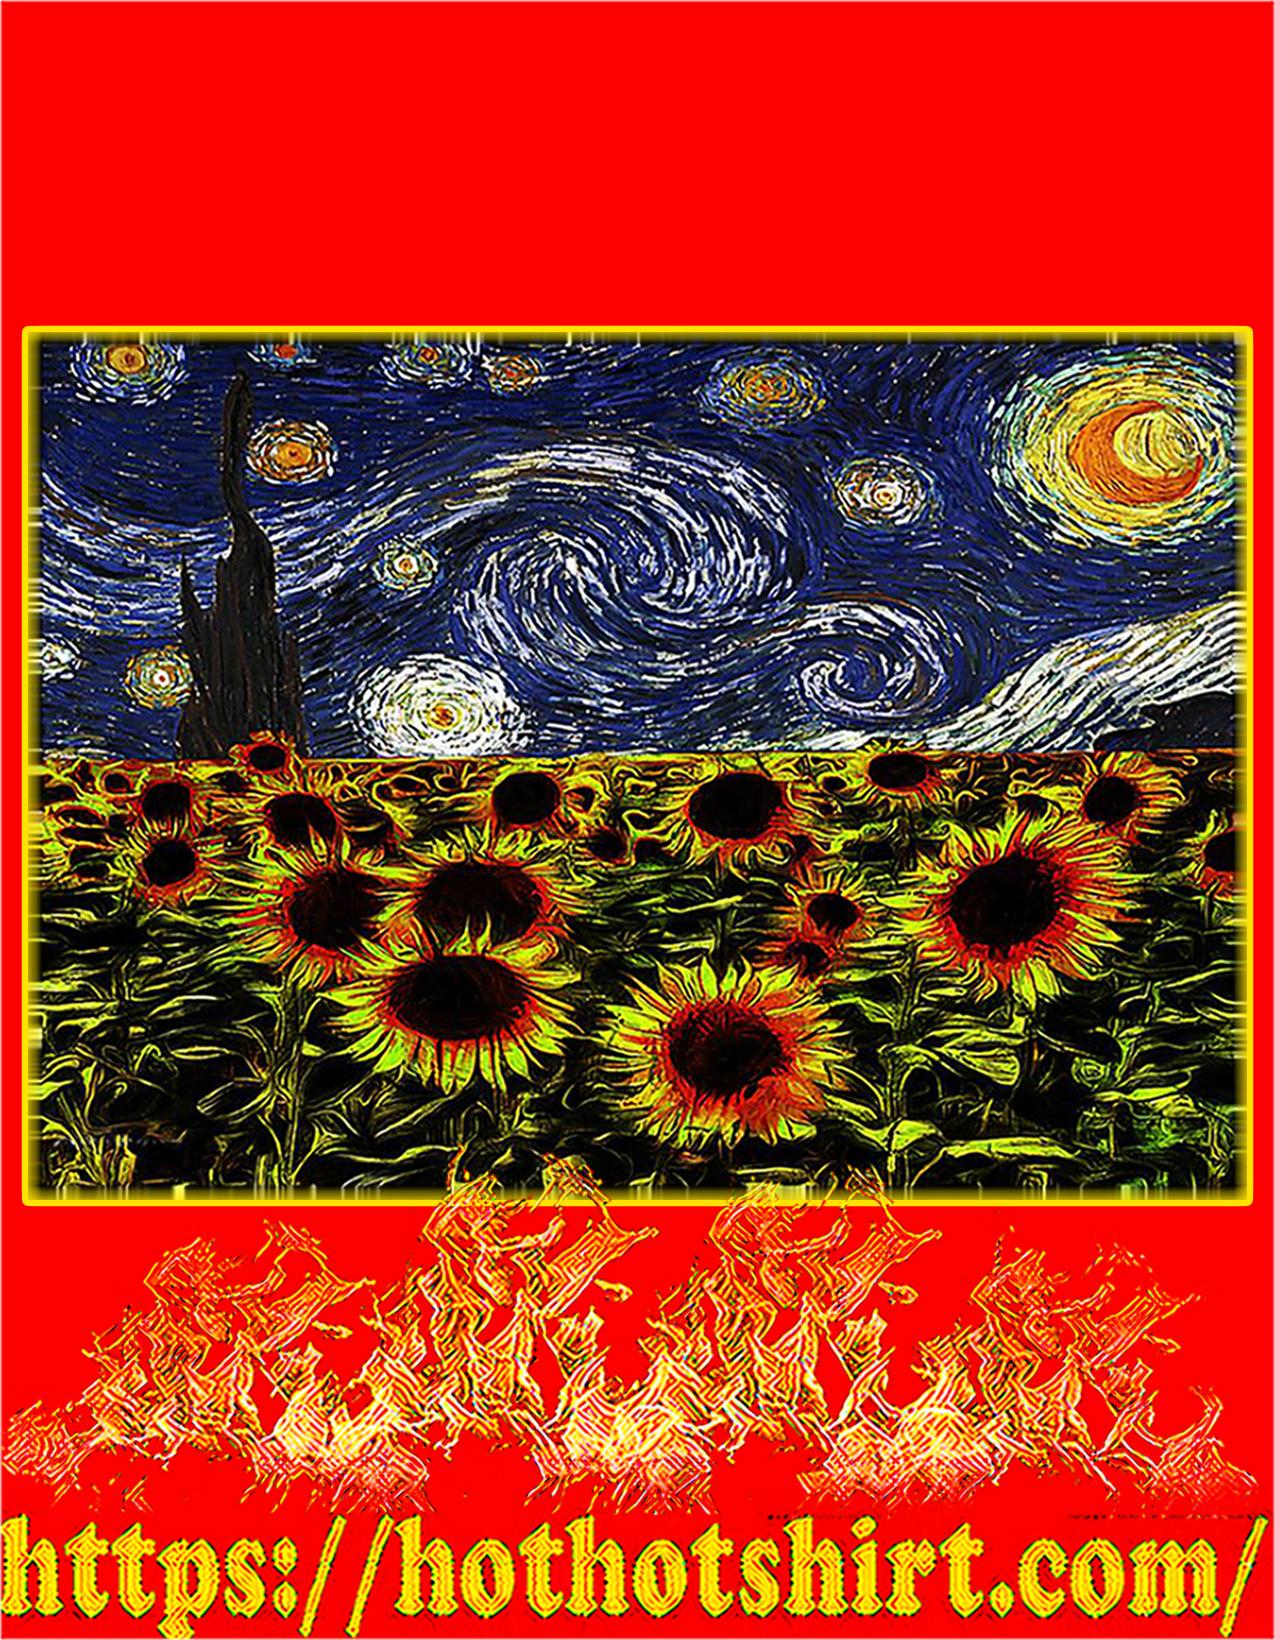 Sunflowers starry night van gogh poster - A2